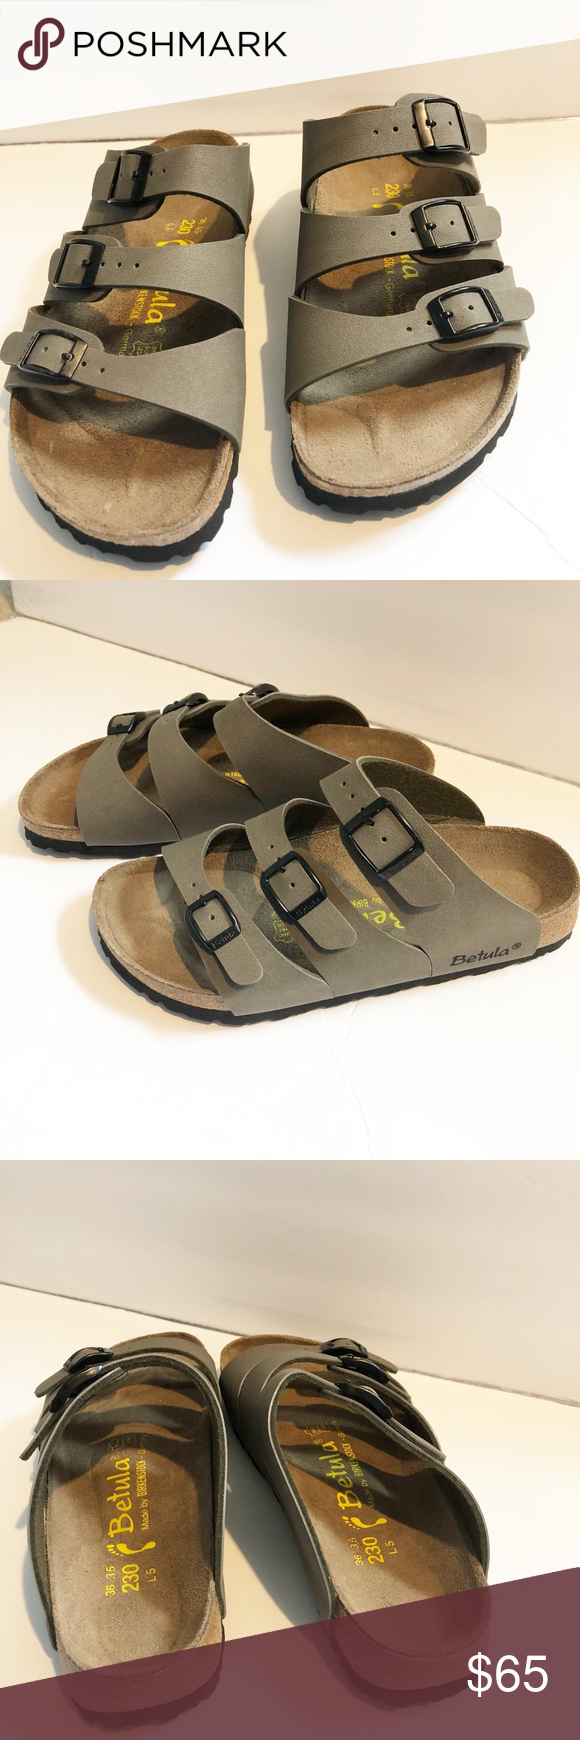 18cb558c97a8 Betula by Birkenstock Leo 3 Strap Sandal Size 36 Betula Birkenstock 3 Strap  Size 36 New without tags SANDAL FEATURES • Backless slide style • Triple  buckle ...